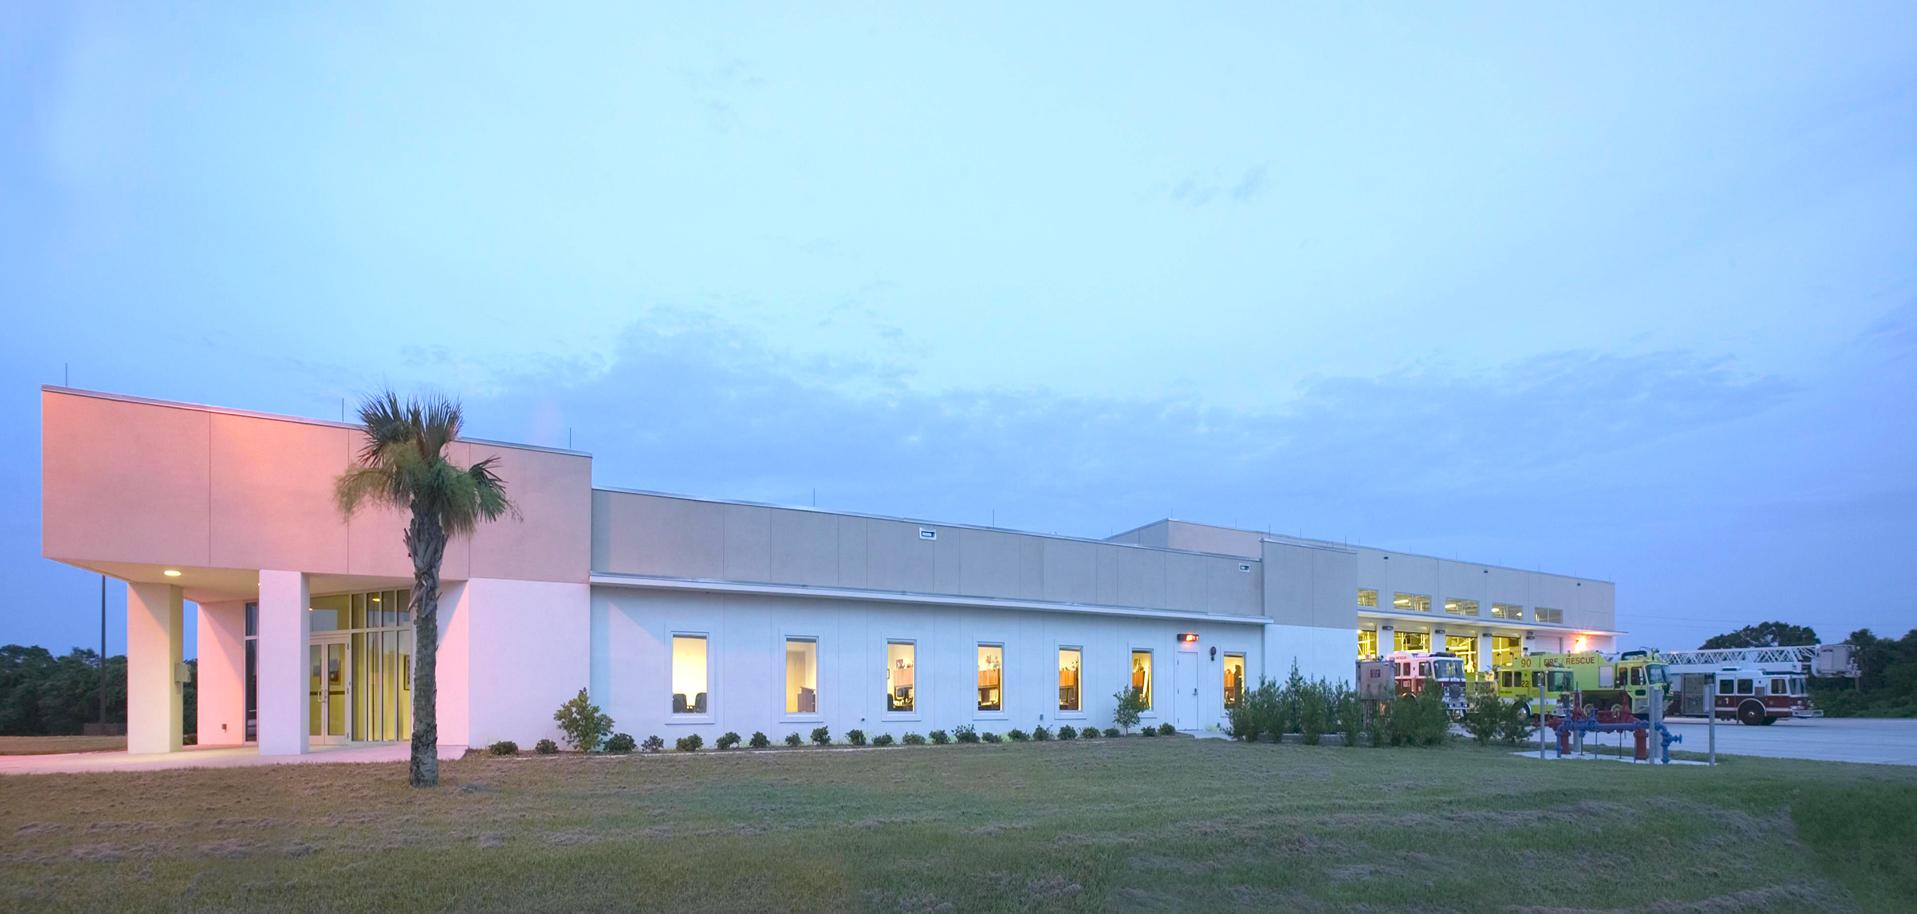 FIRE / CRASH RESCUE STATION    Cape Canaveral Air Force Station  Cape Canaveral, FL